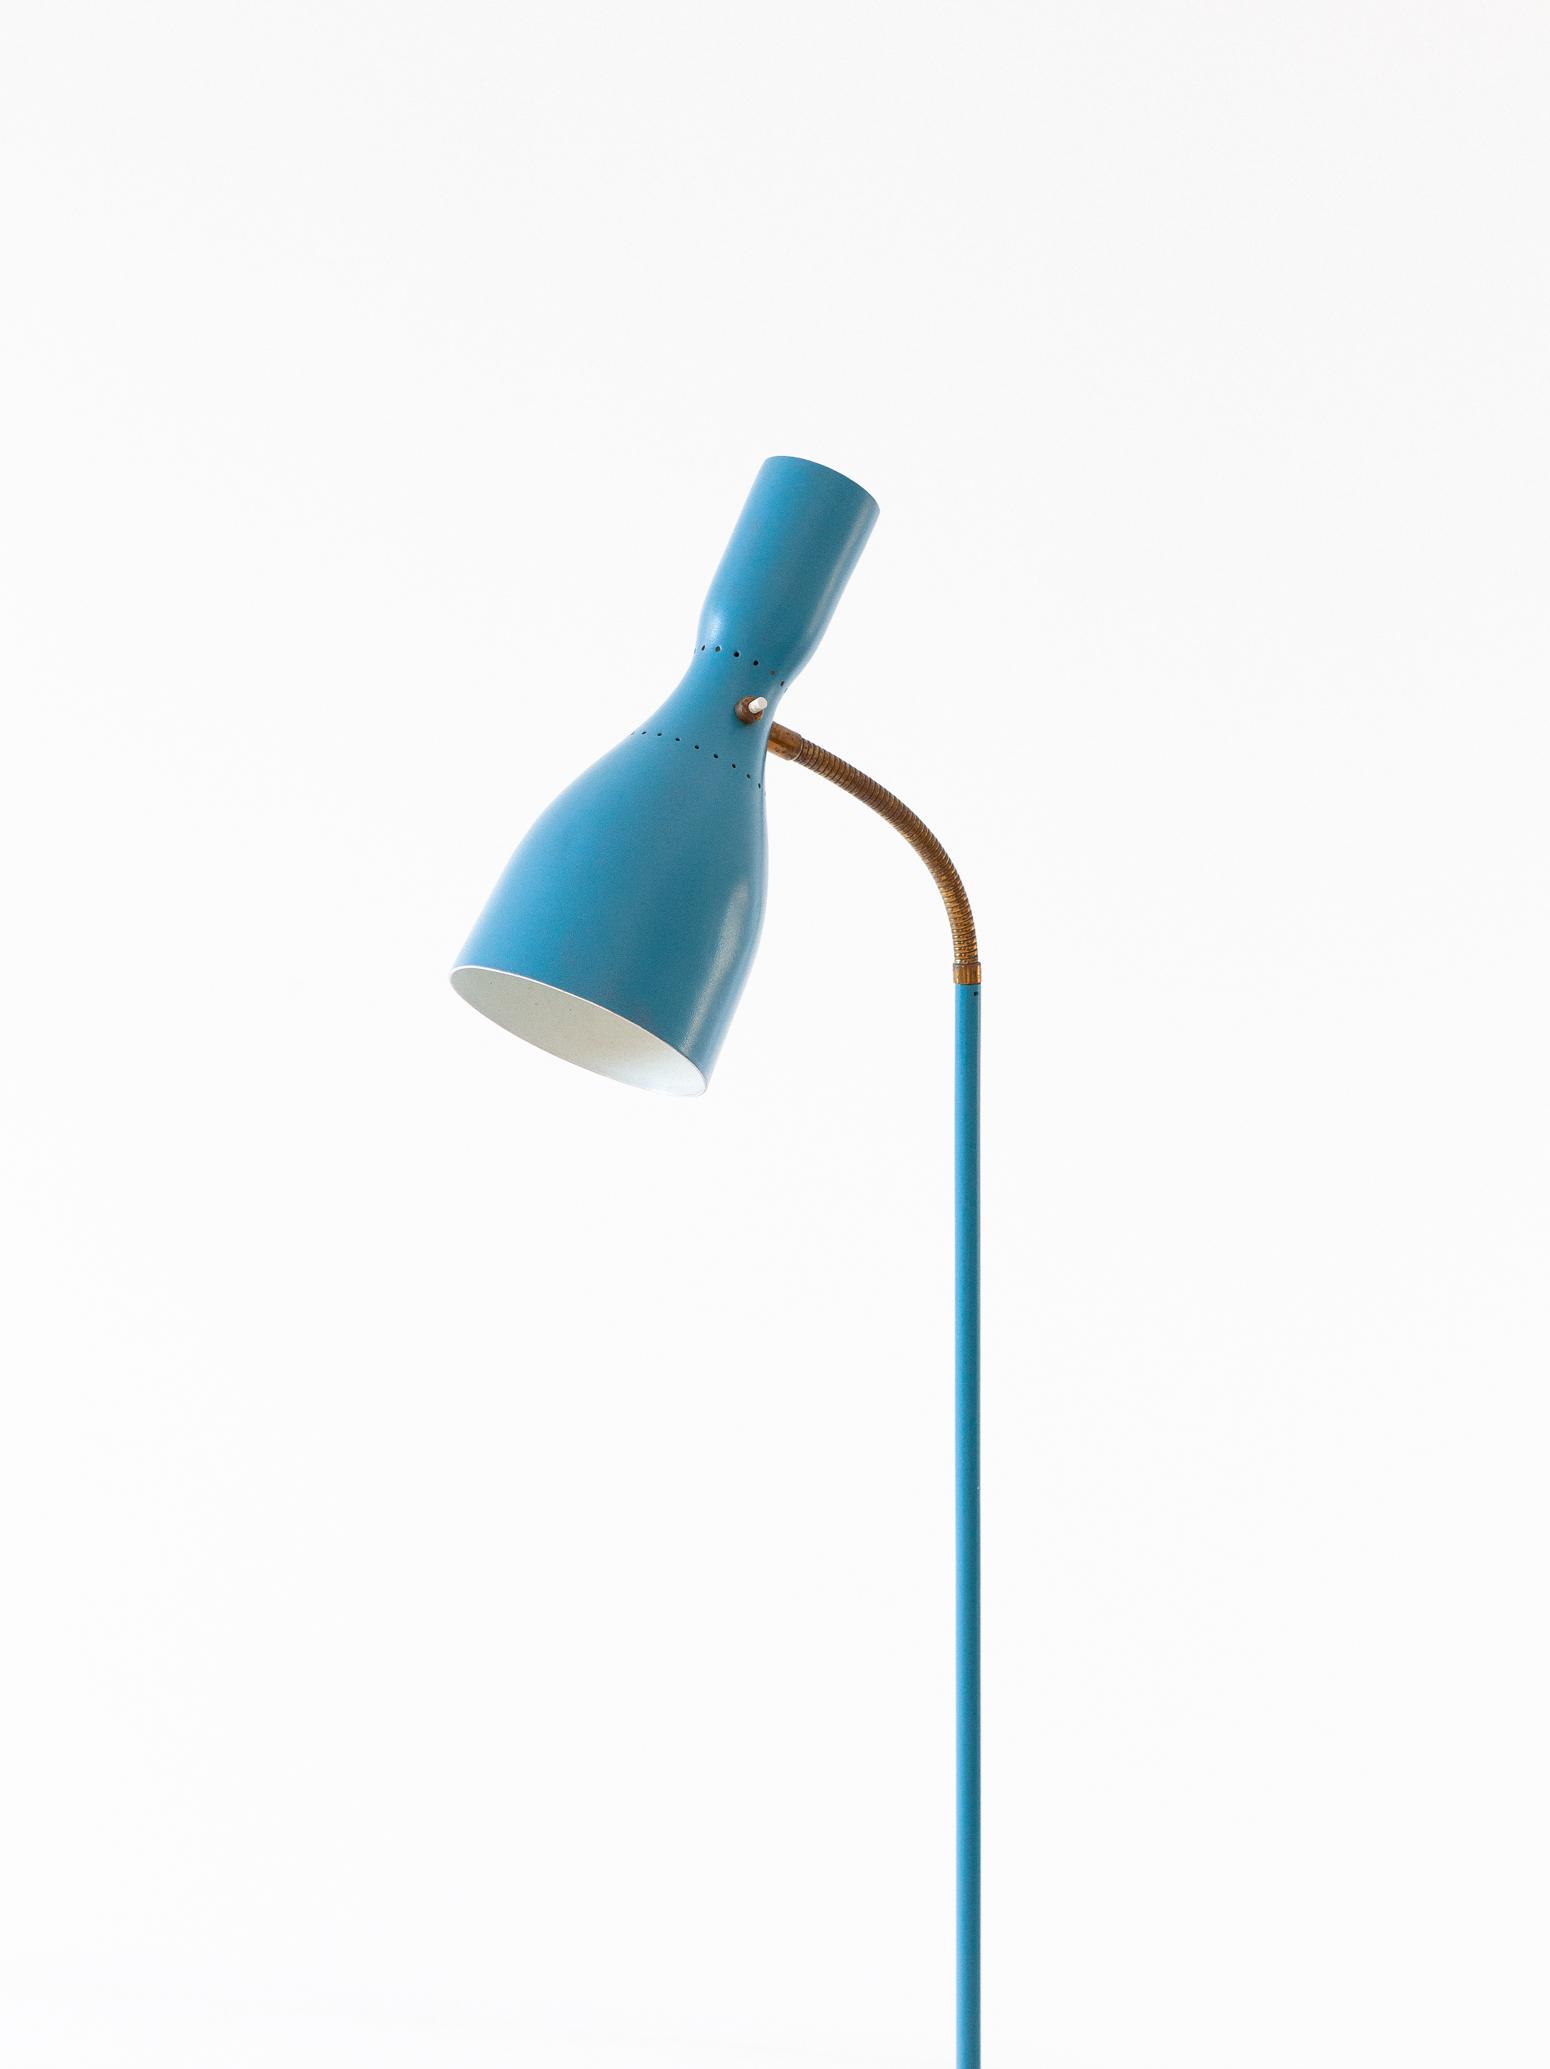 1950s-italian-blue-brass-floor-lamp-2-L79